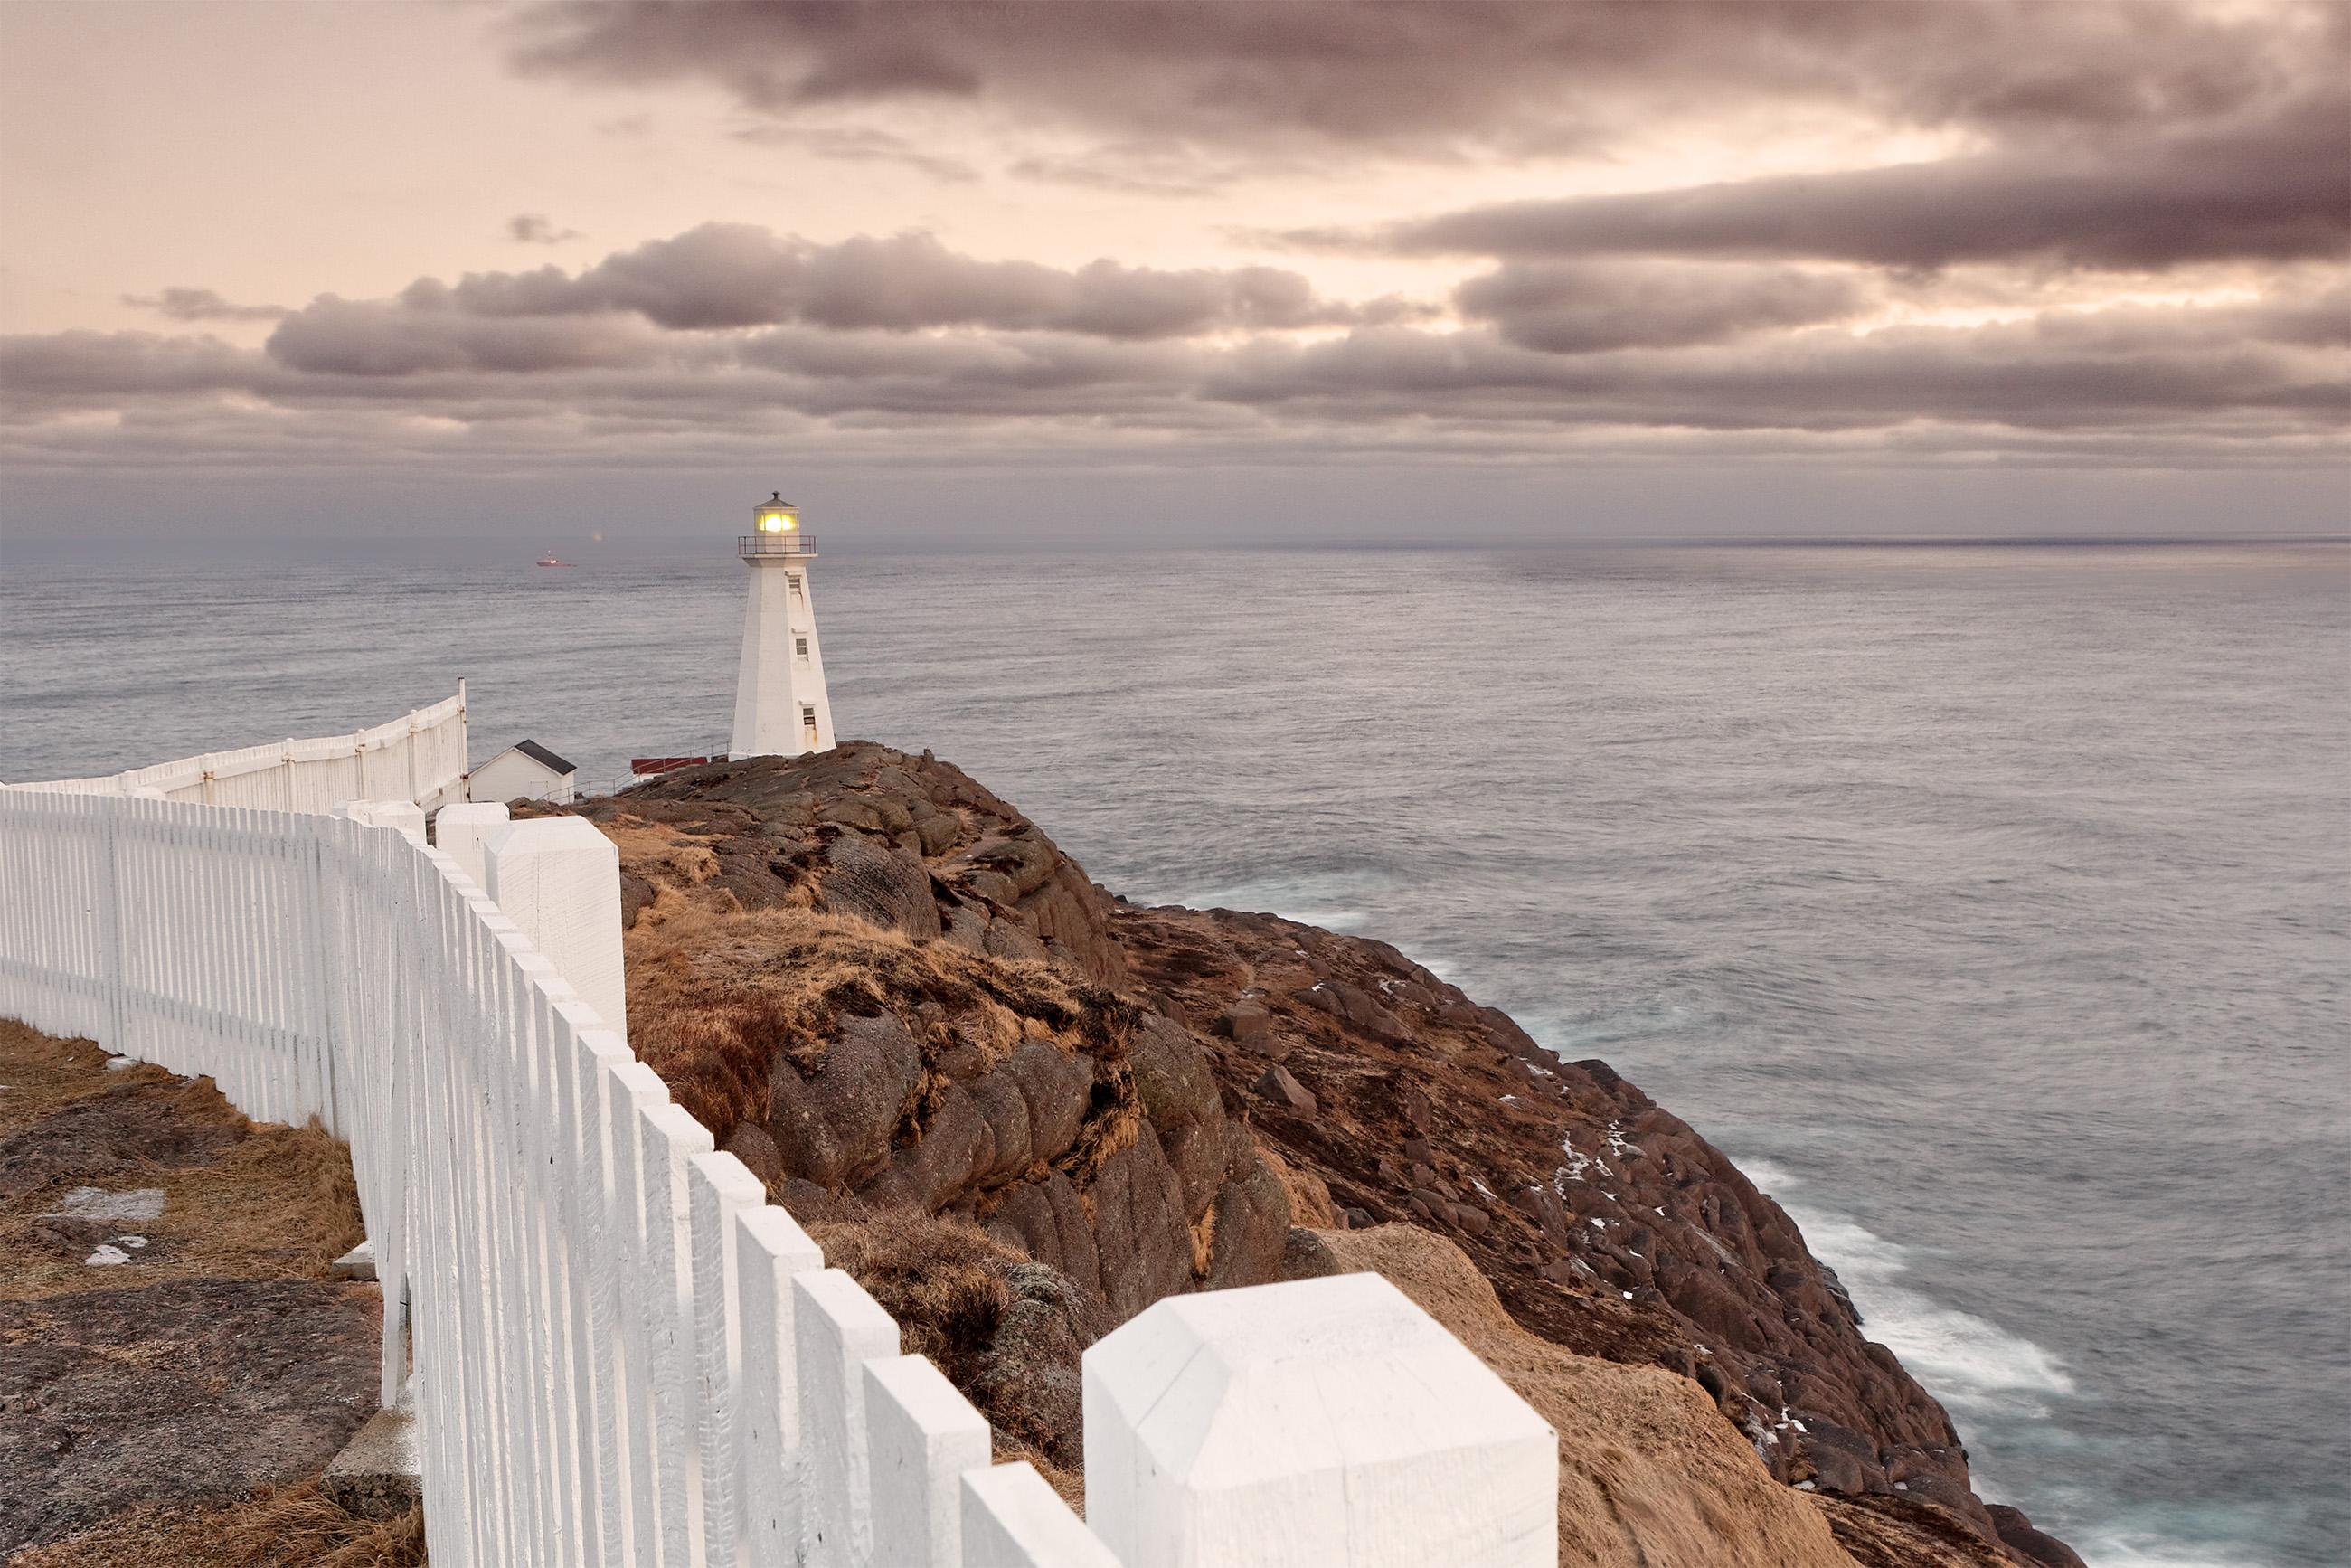 Lighthouse, Blue, Ocean, Vessels, Transportation, HQ Photo